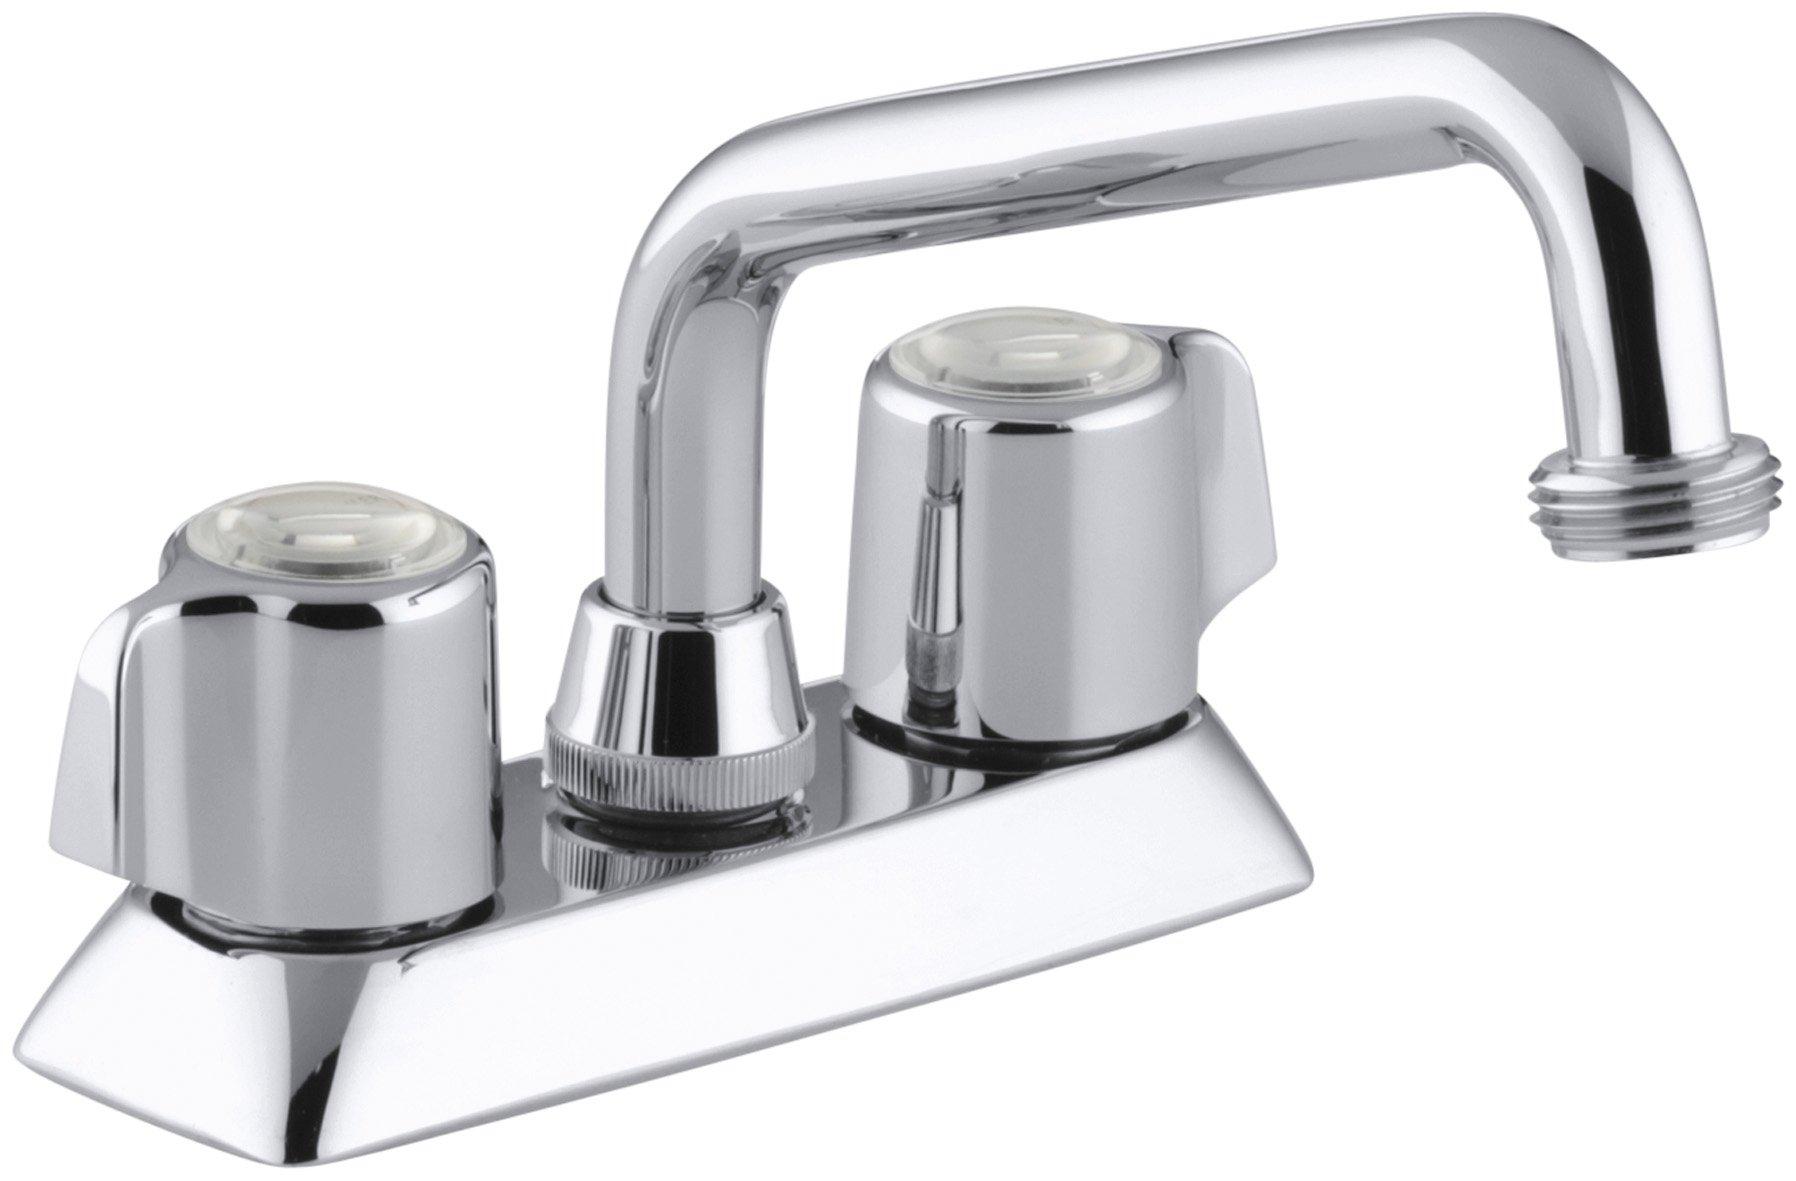 KOHLER K-15271-B-CP Coralais Laundry Sink Faucet, Polished Chrome by Kohler